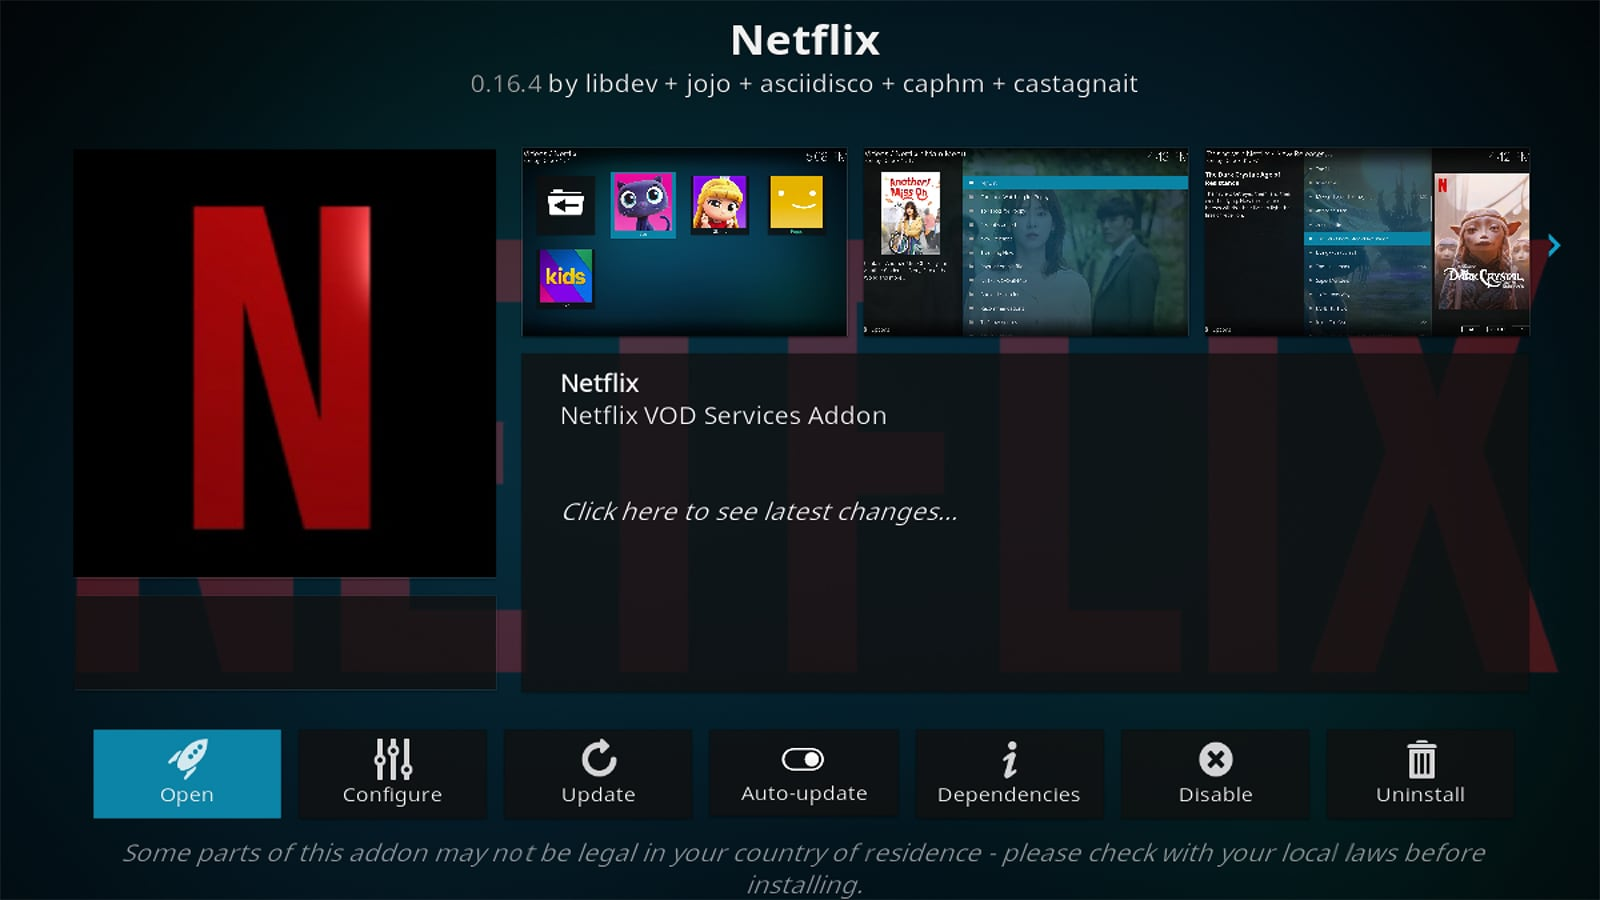 How To Install Netflix Addon On Kodi In 2021 6 Simple Steps Technadu